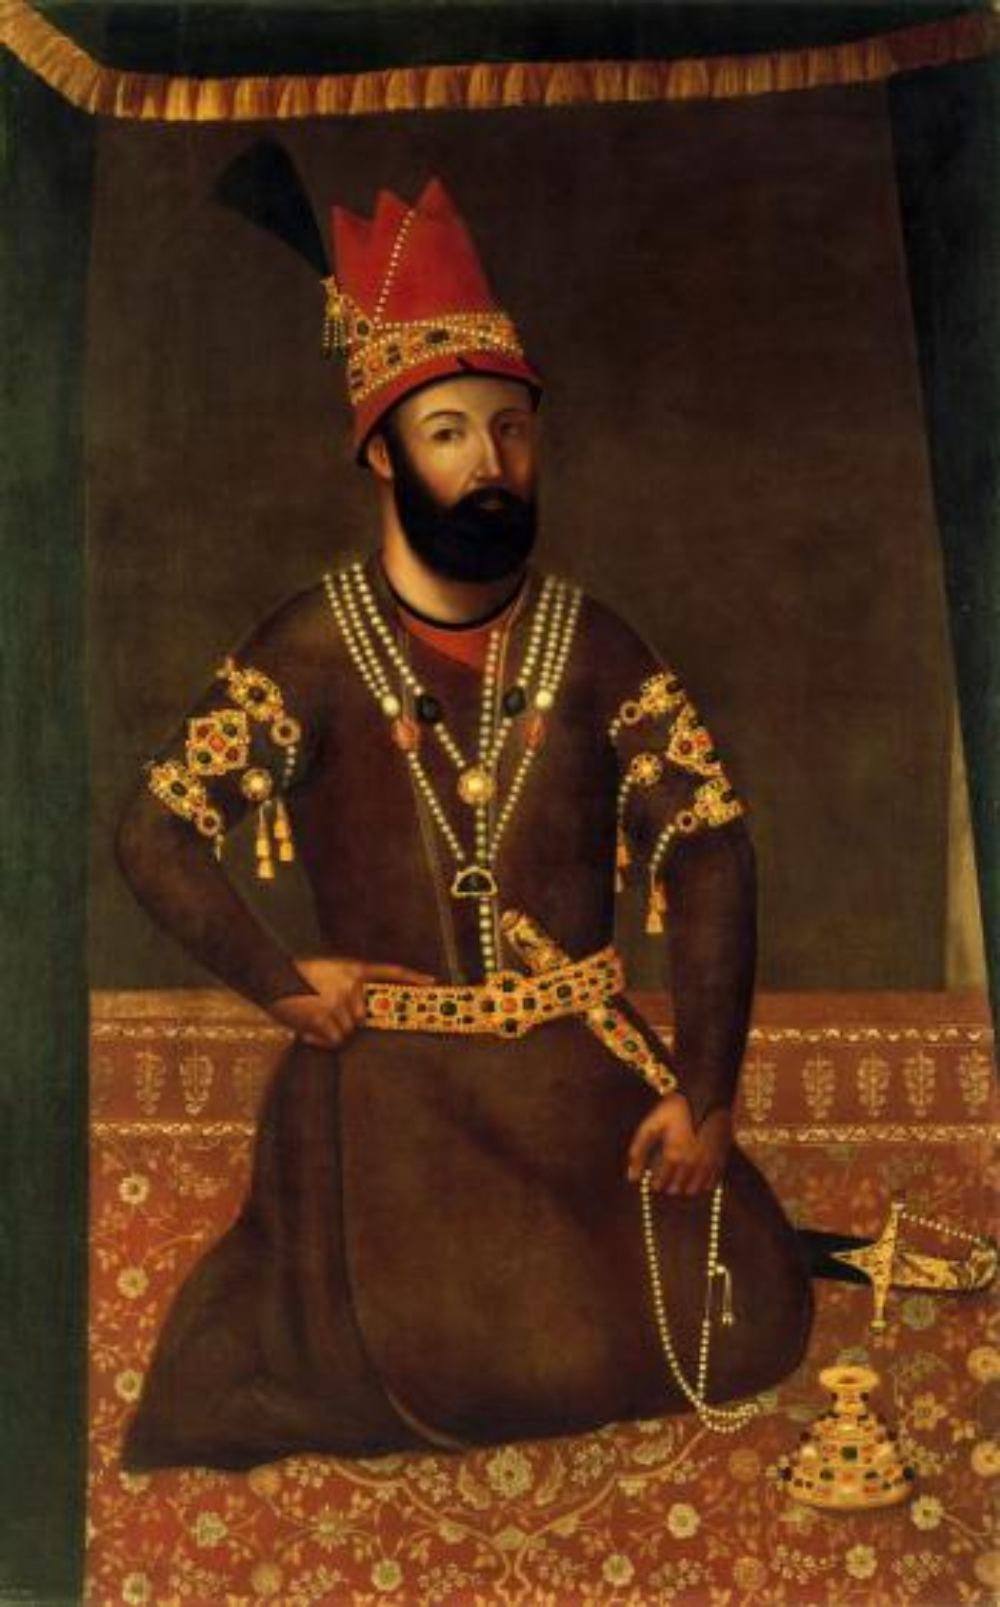 India-kohinoor-diamond-history